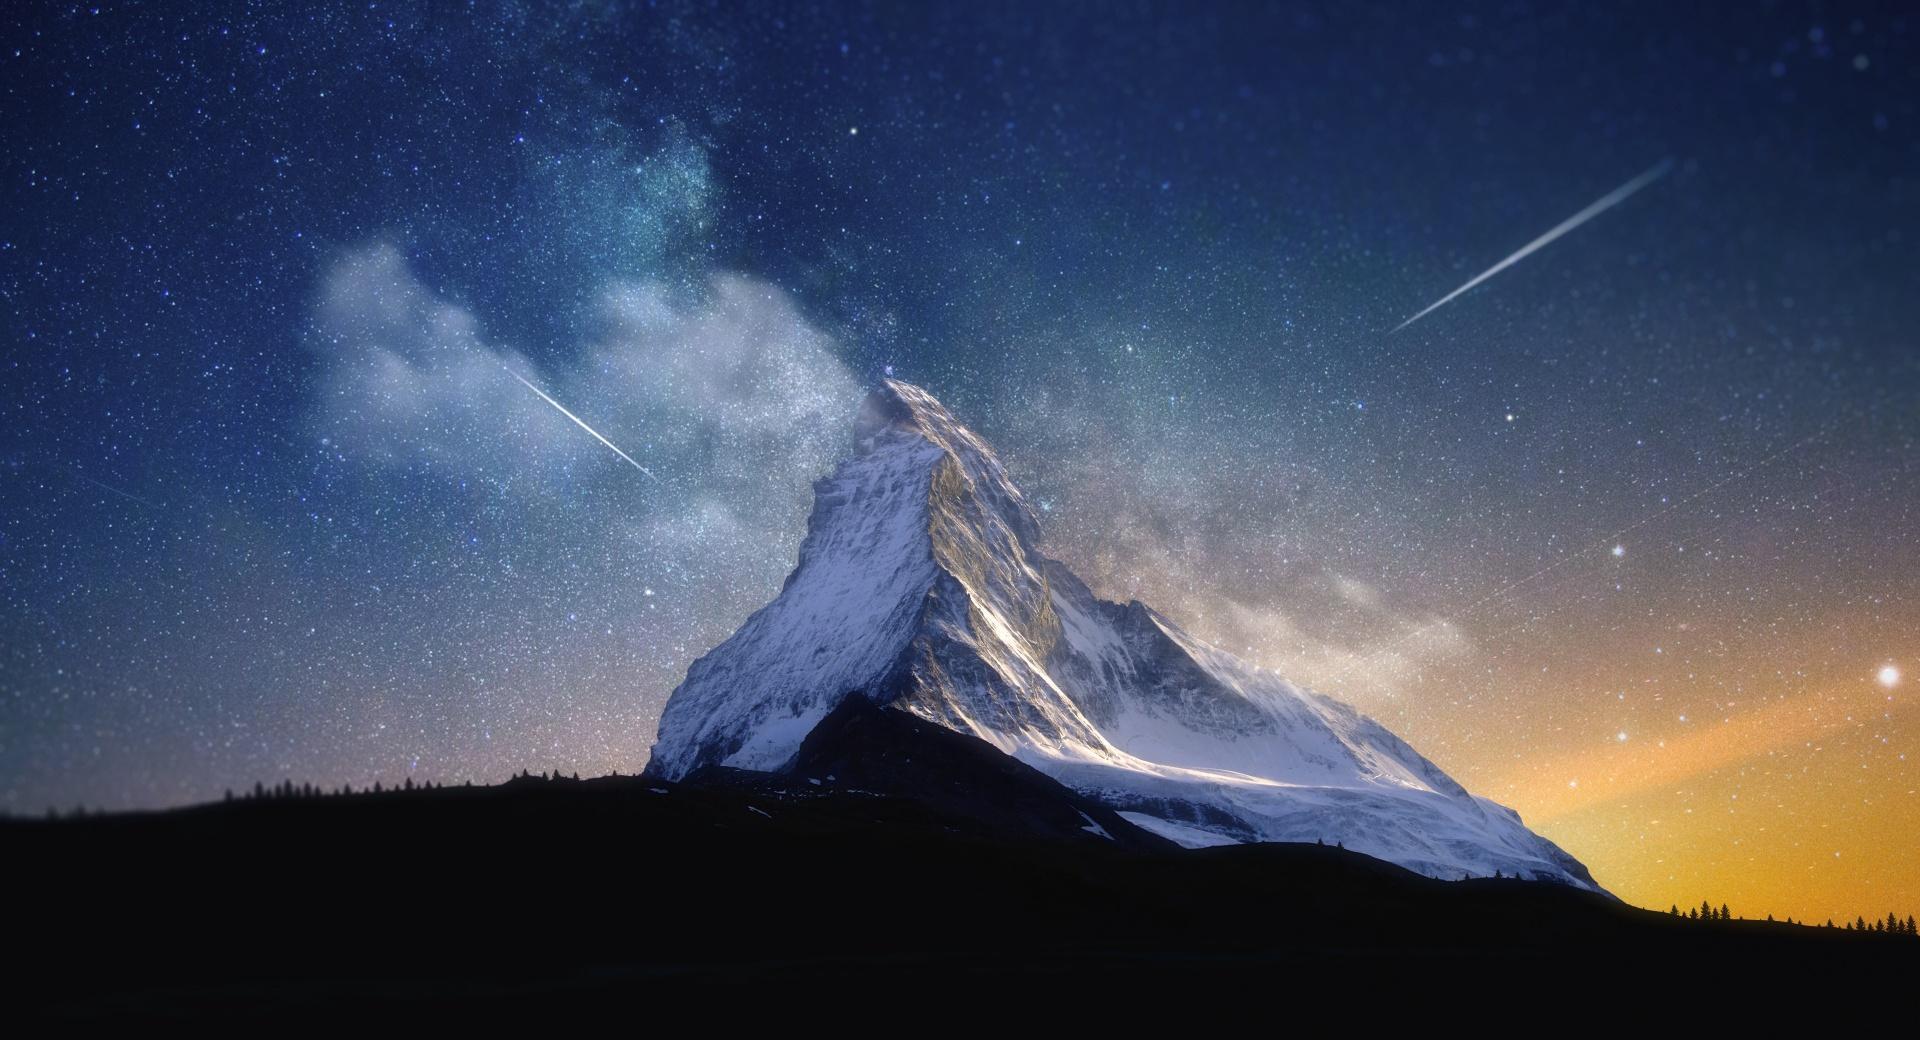 Milky Way Mountain by Yakub Nihat wallpapers HD quality